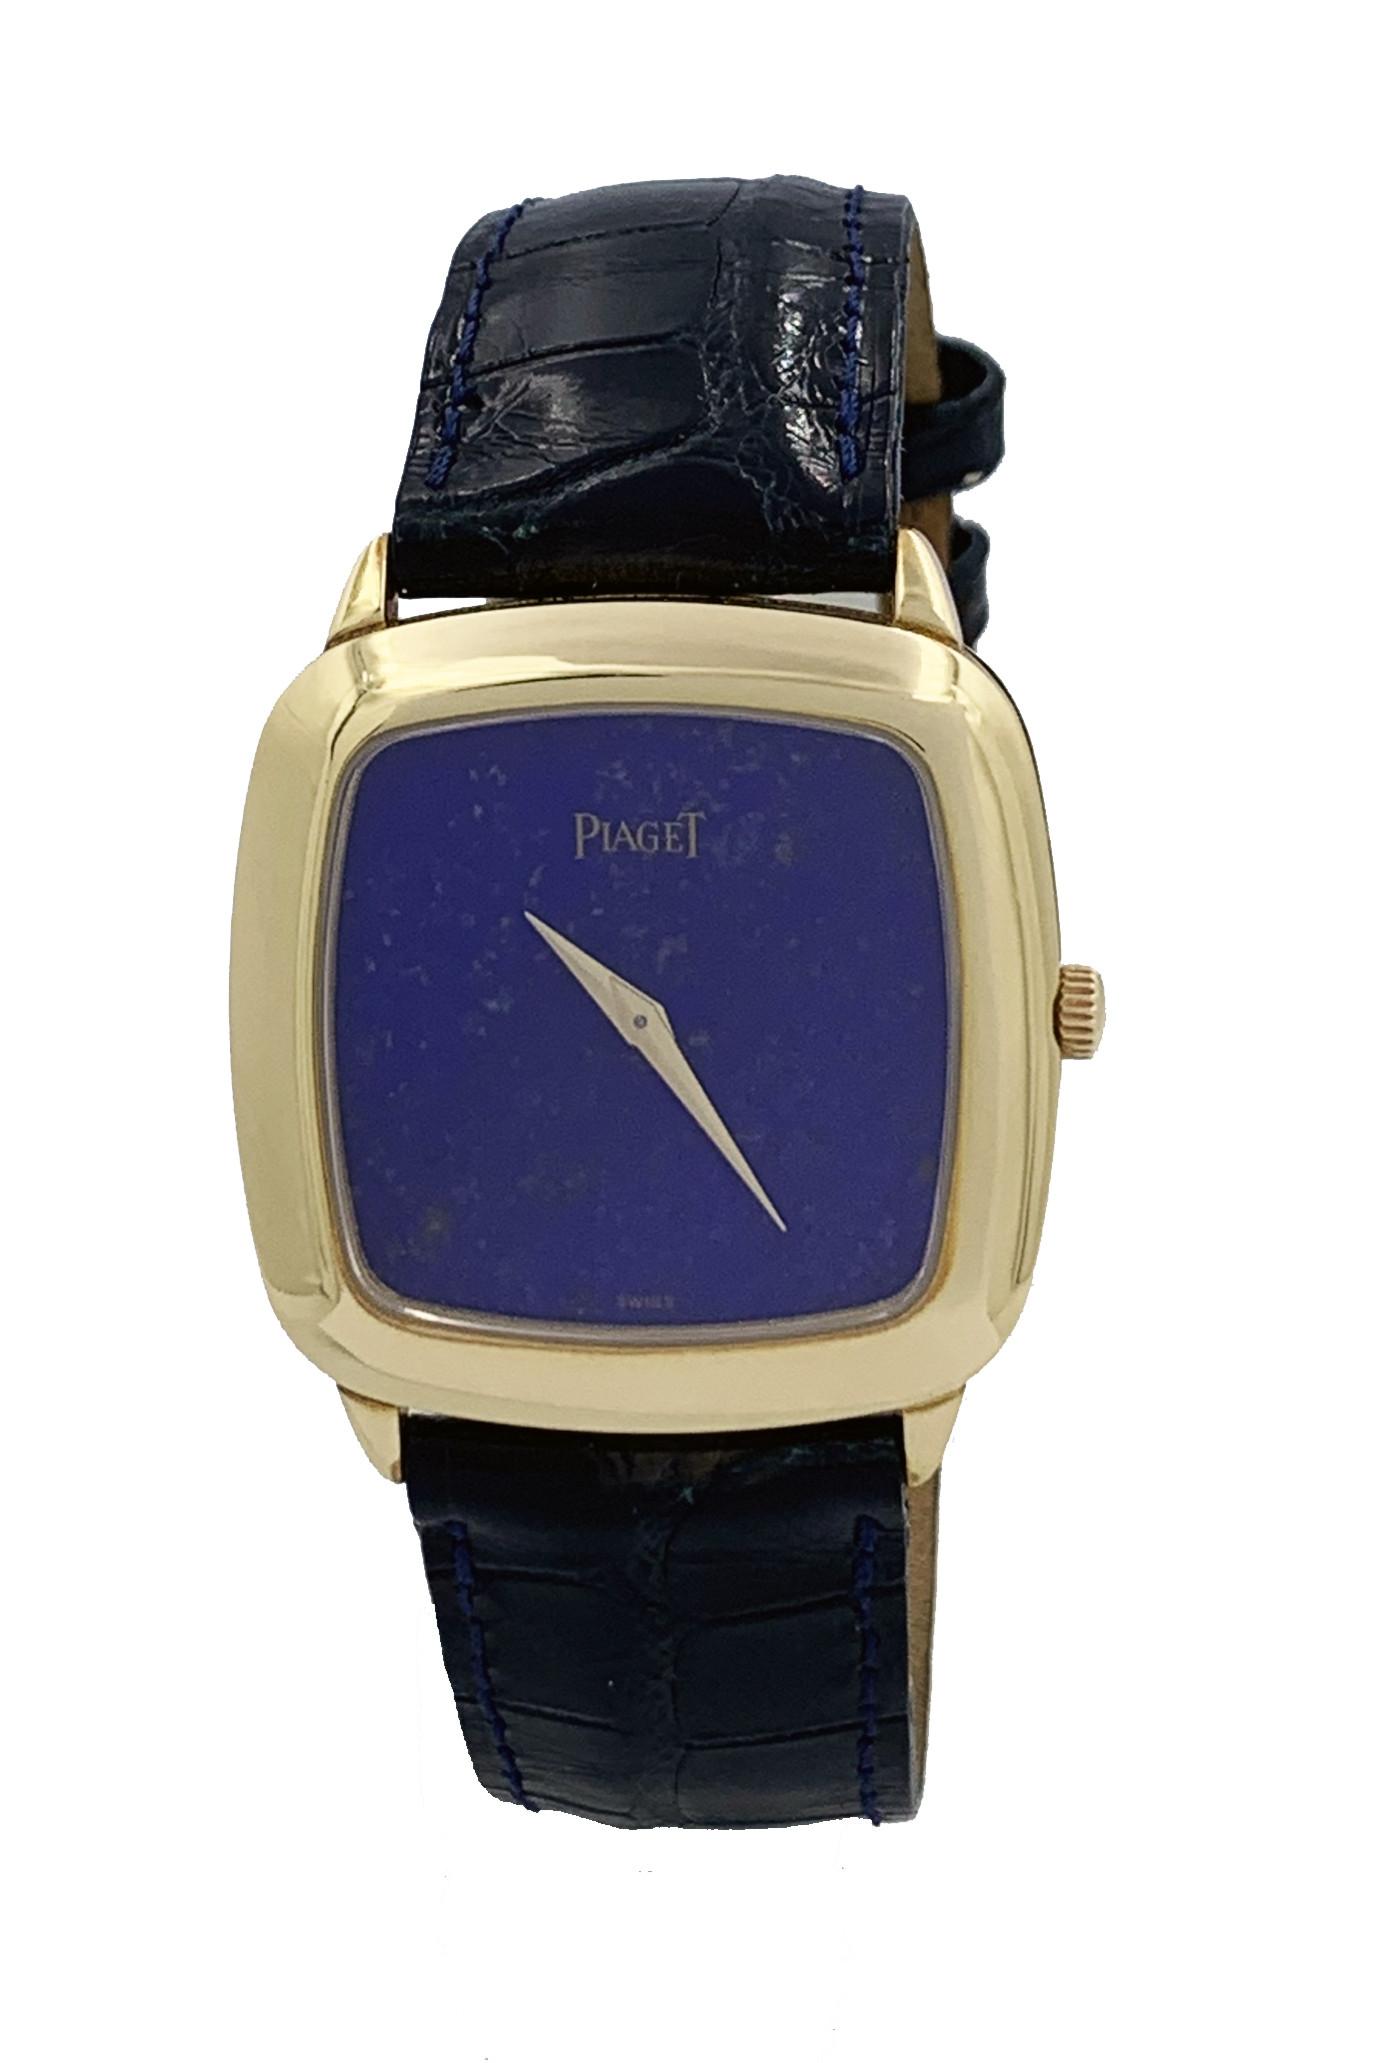 Piaget Vintage Lapislazzuli NOS Ref. 9928N